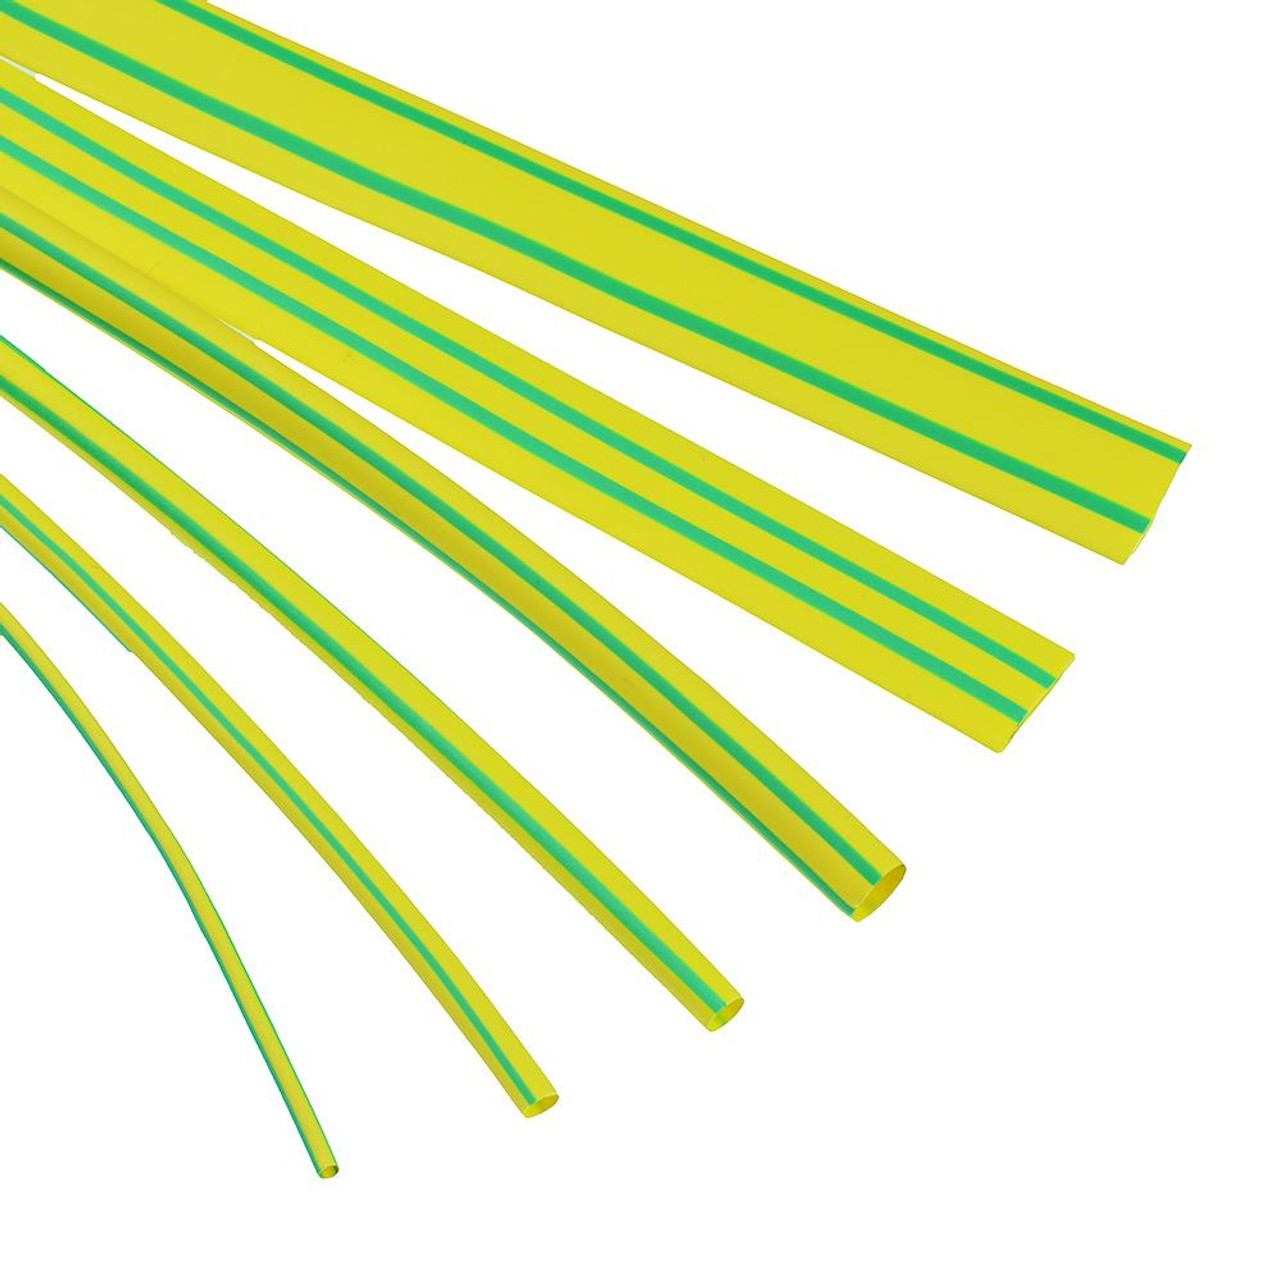 Green/Yellow Thin Wall Heatshrink 20.0mm-10.0mm 1.2m Length